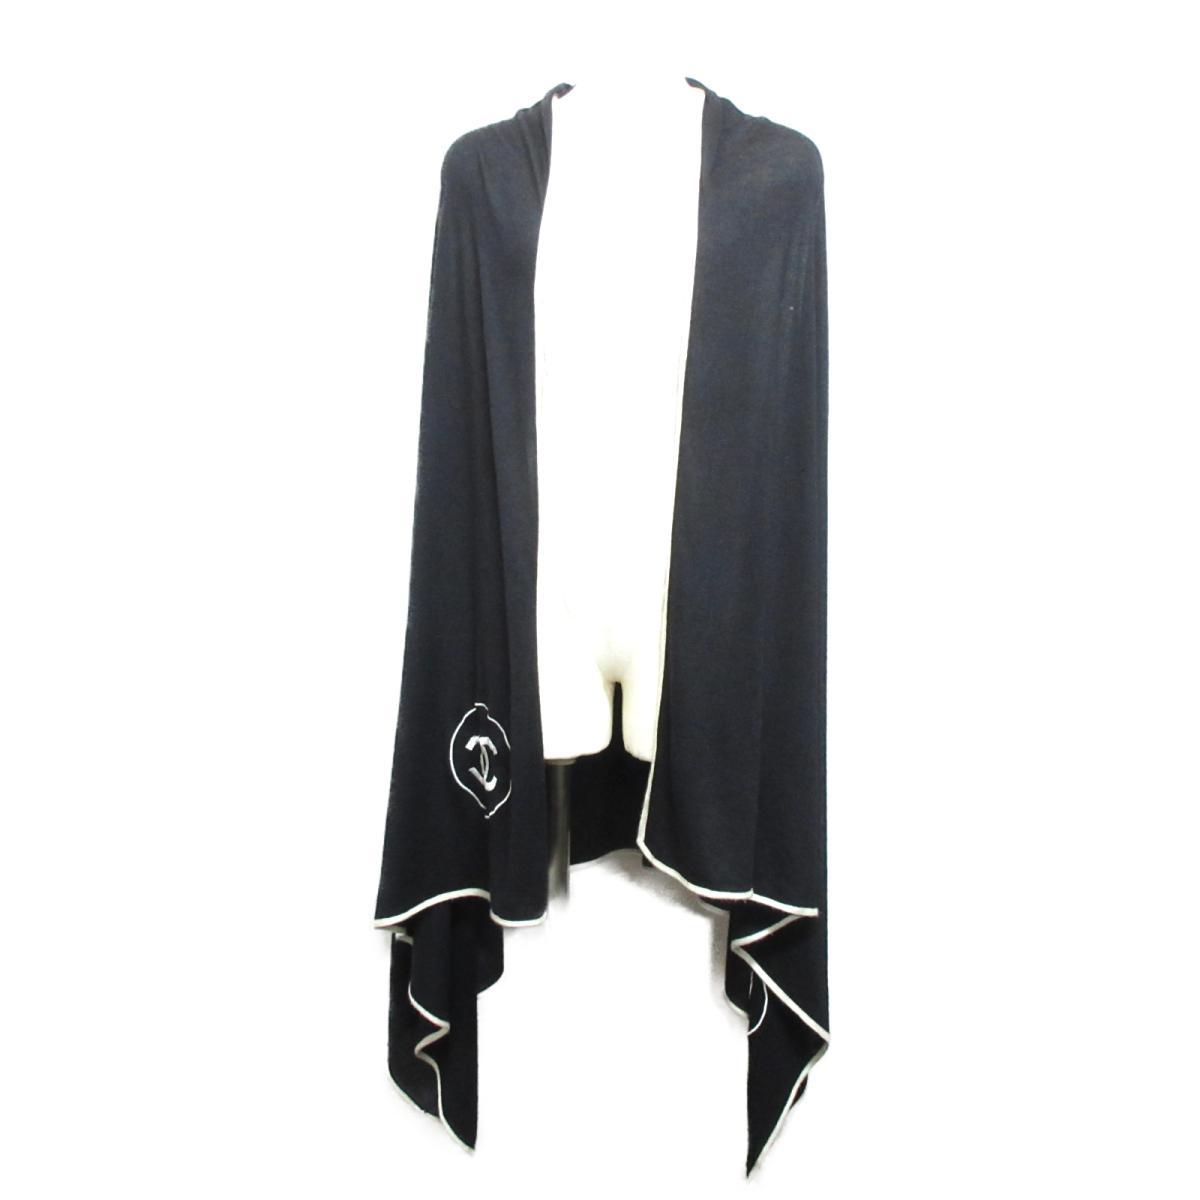 0417ca066a8e シャネル ストール レディース 70%カシミア x 30%シルク ブラック ホワイト | CHANEL BRANDOFF ブランド